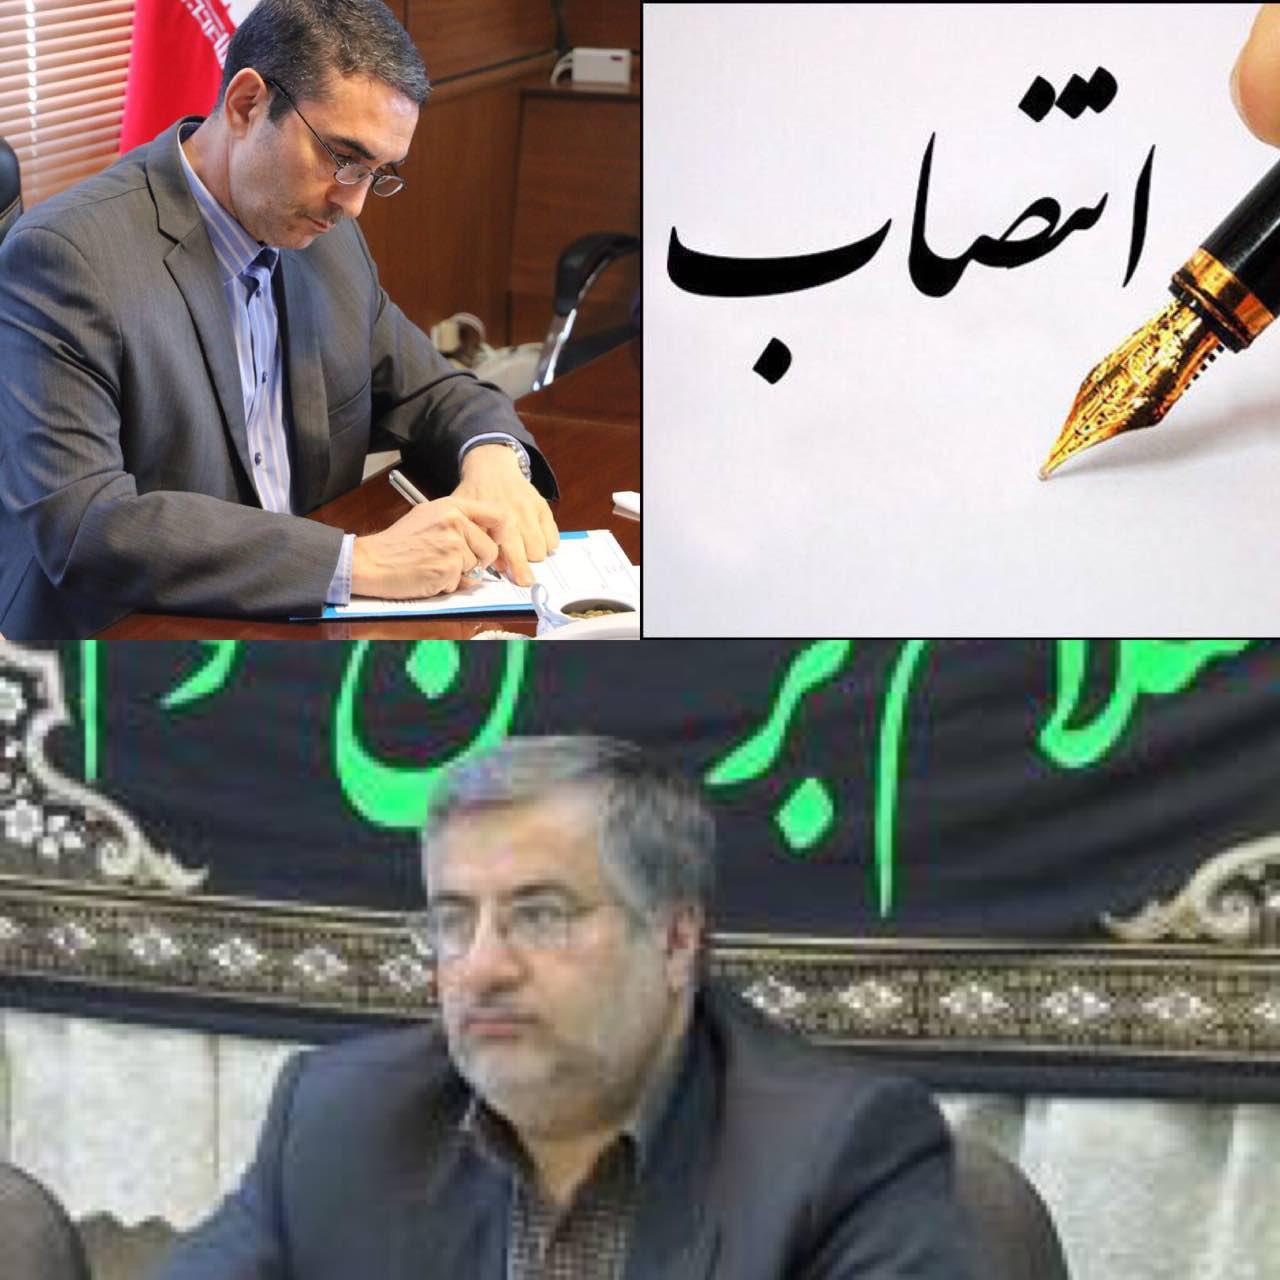 انتصاب سرپرست فرمانداري شهرستان تفرش